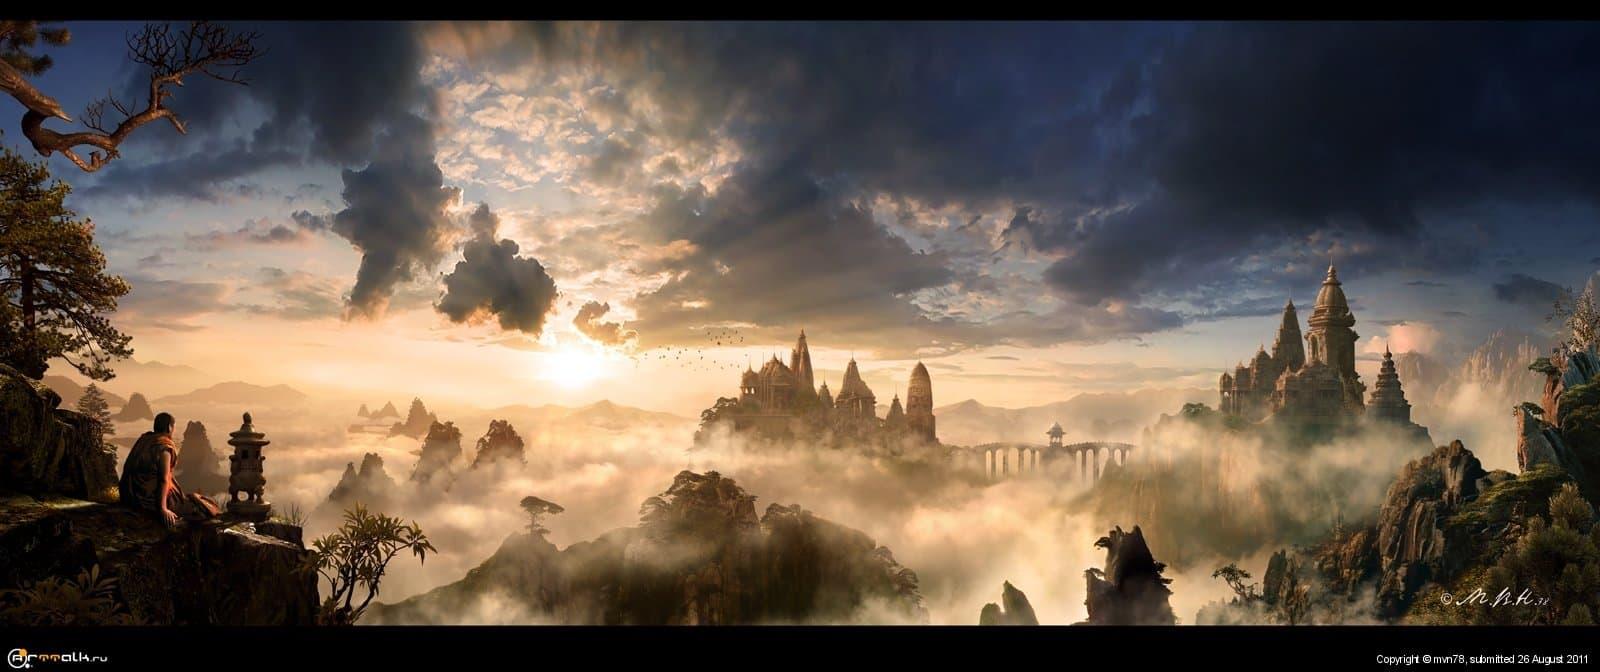 Храмовая долина